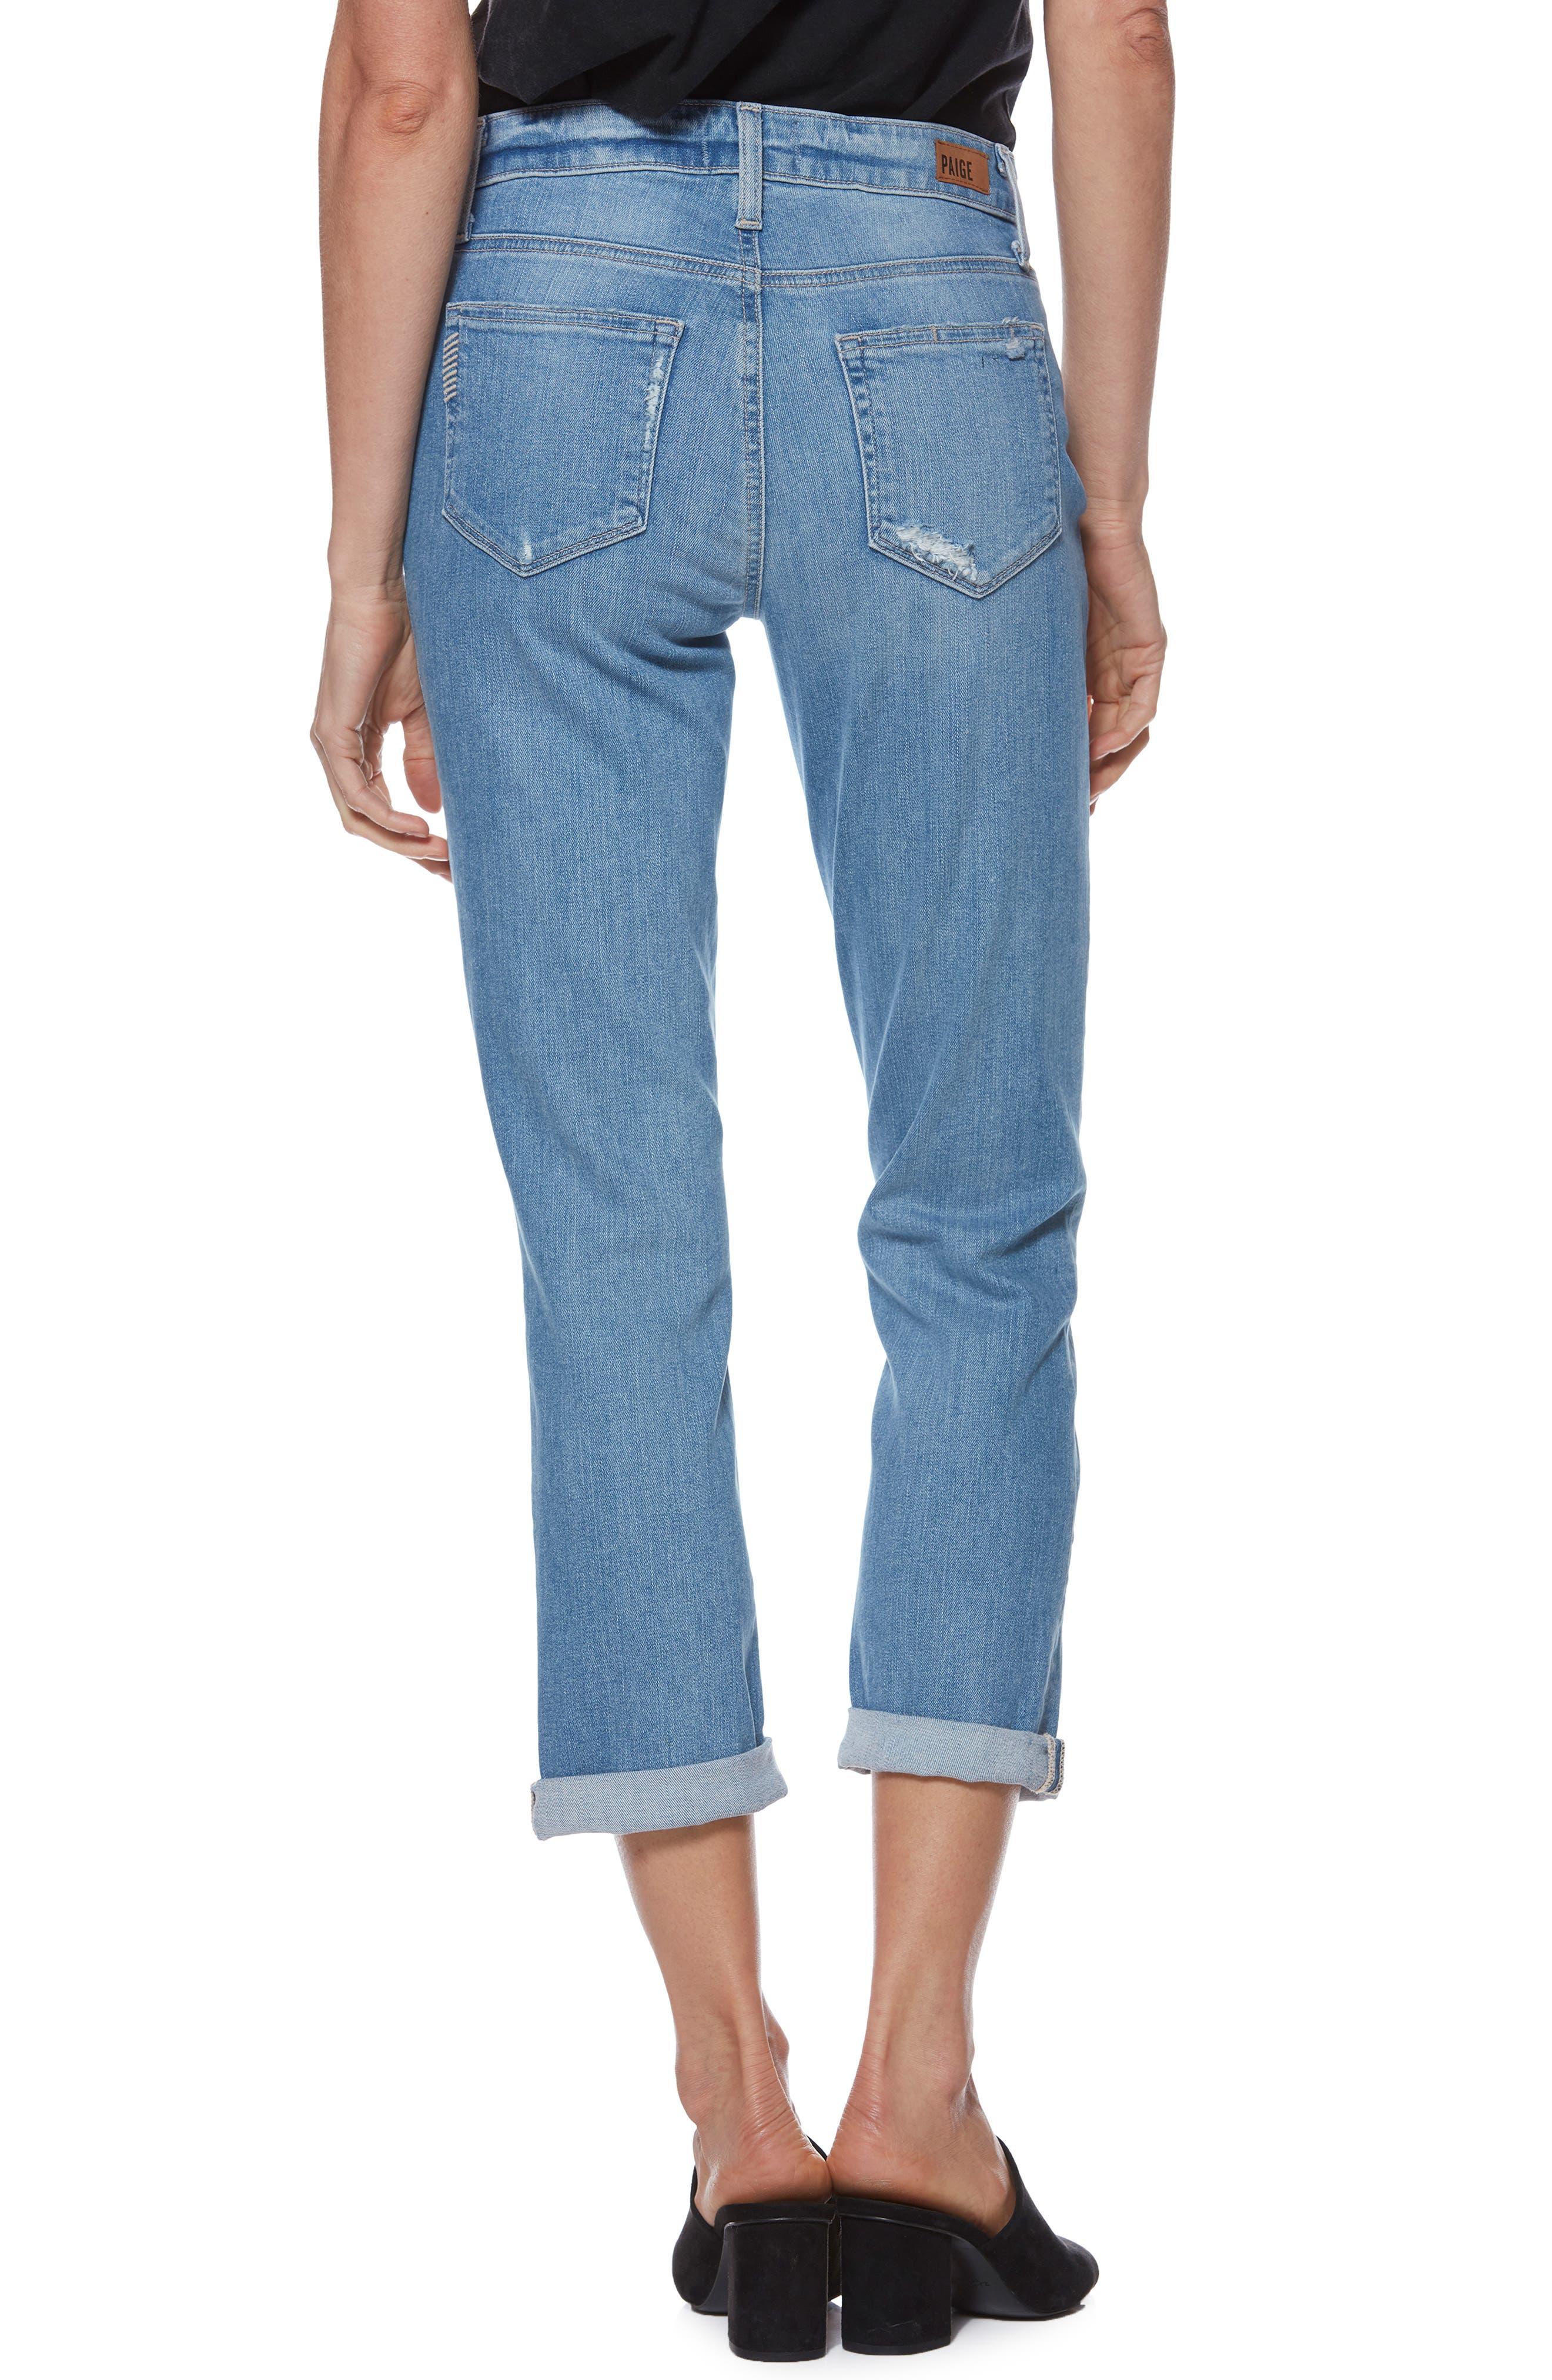 Transcend Vintage - Jimmy Jimmy High Waist Crop Boyfriend Jeans,                             Alternate thumbnail 2, color,                             ATTERBURY